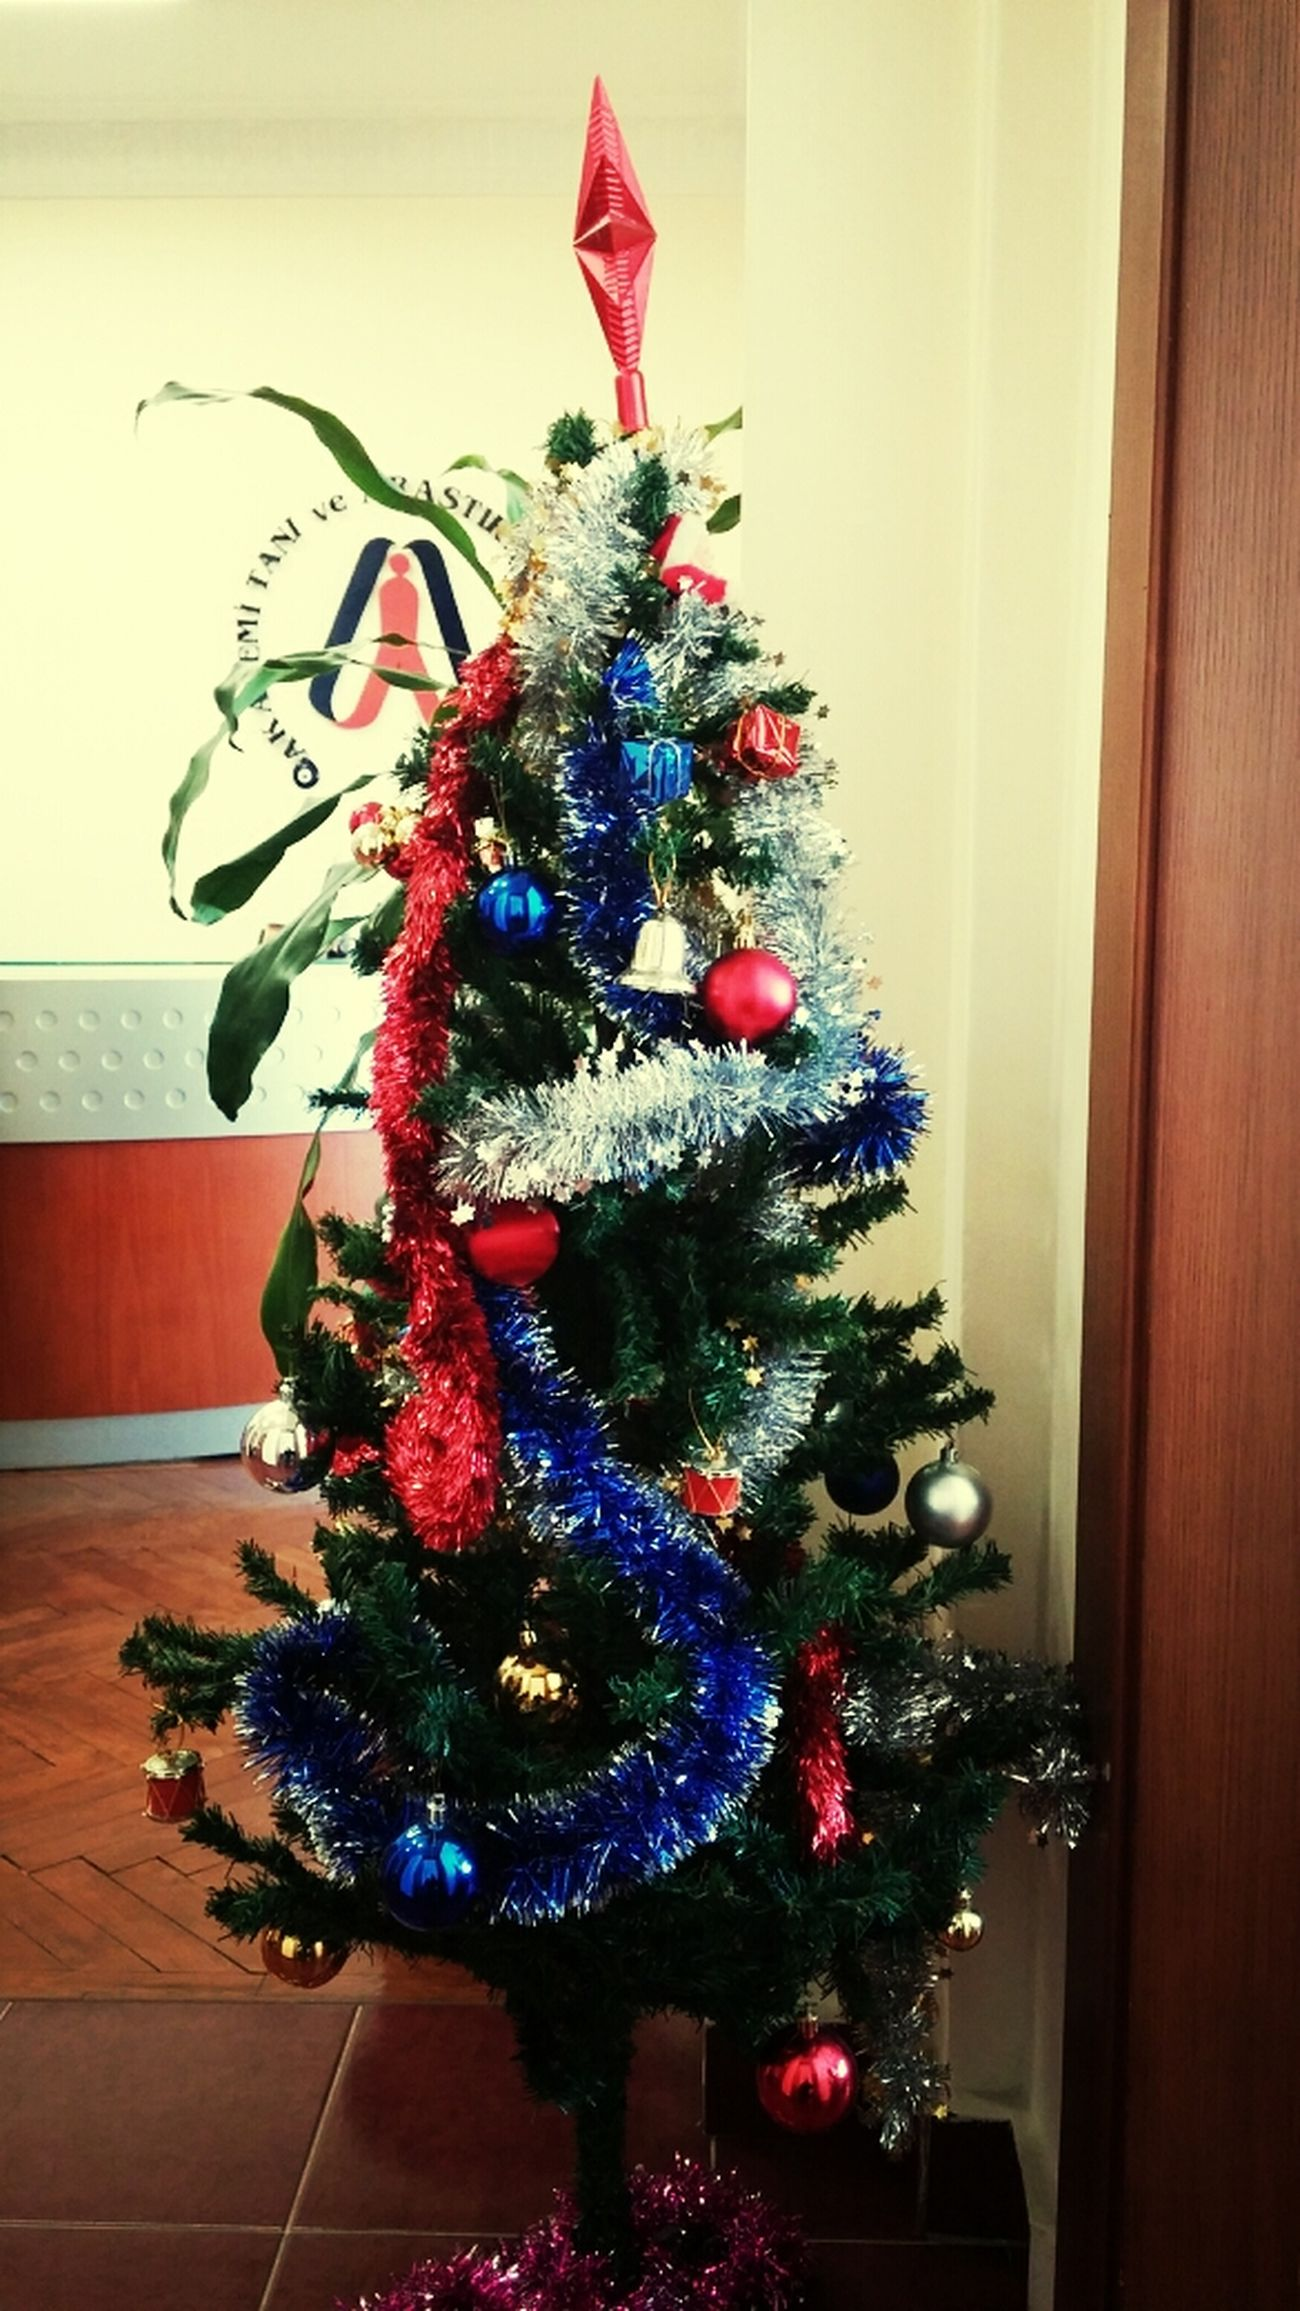 Noël Yılbaşı:) Yılbaşı Ağacı 2014